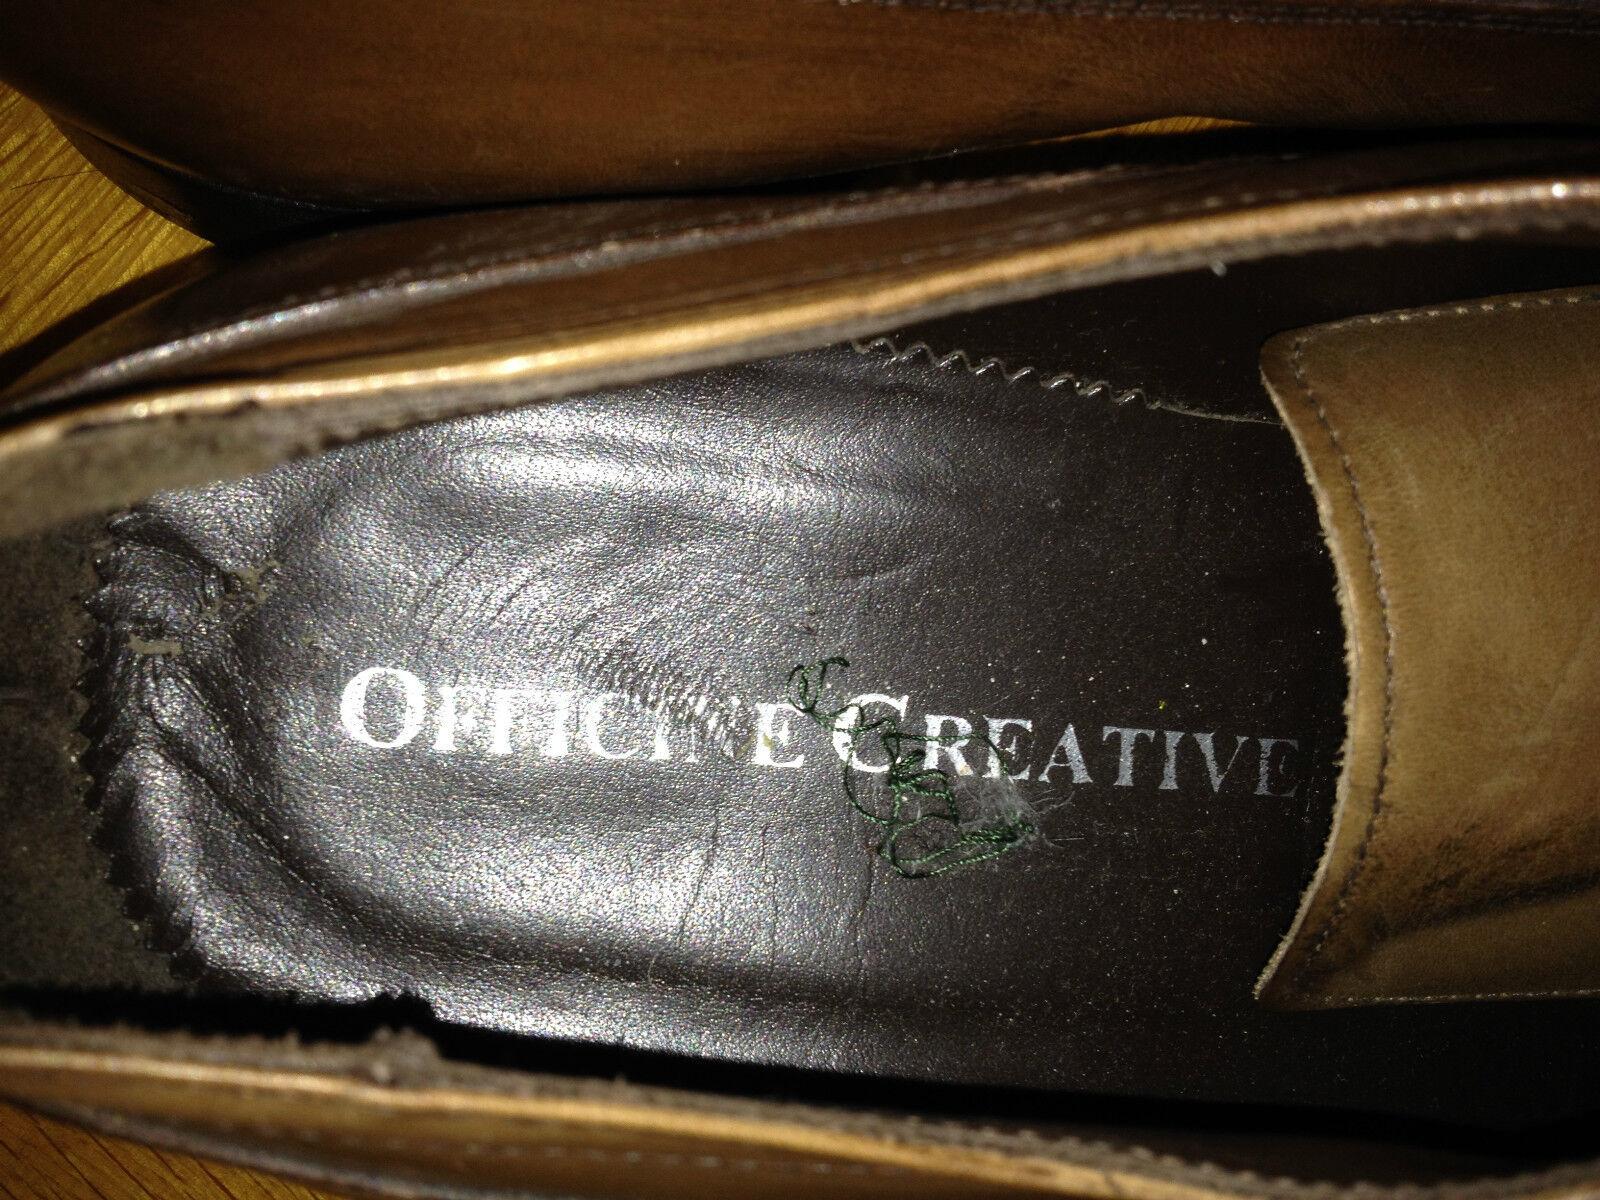 Officine Creative Marronee Marronee normalissime DRESS DRESS DRESS scarpe US 12 EUR 45 46 | Un'apparenza Elegante  | Scolaro/Ragazze Scarpa  40da9f